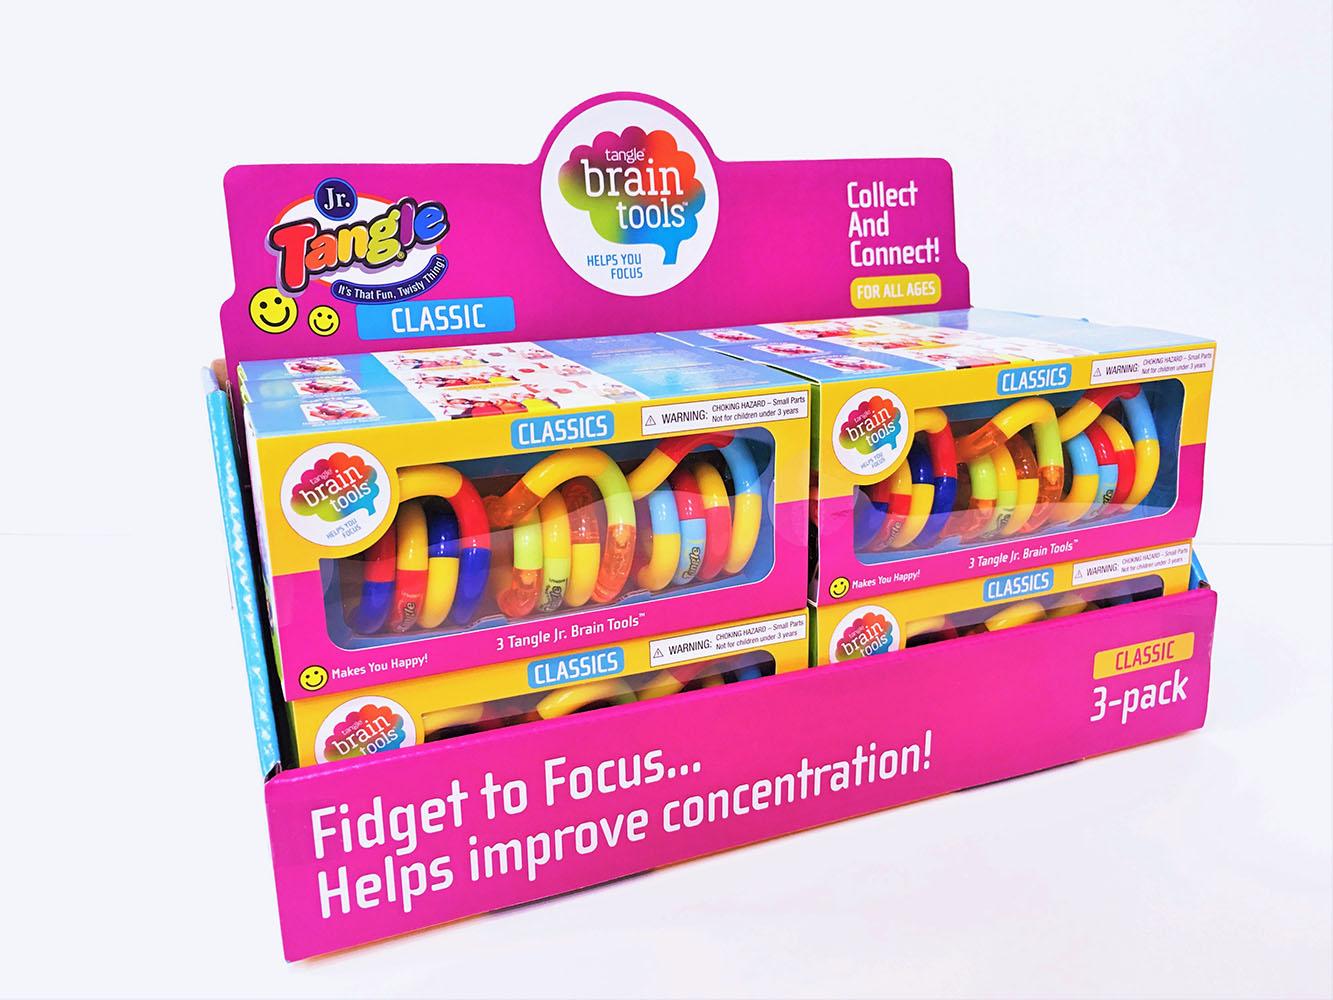 Tangle Jr. - Brain Tools 3-pack Classics